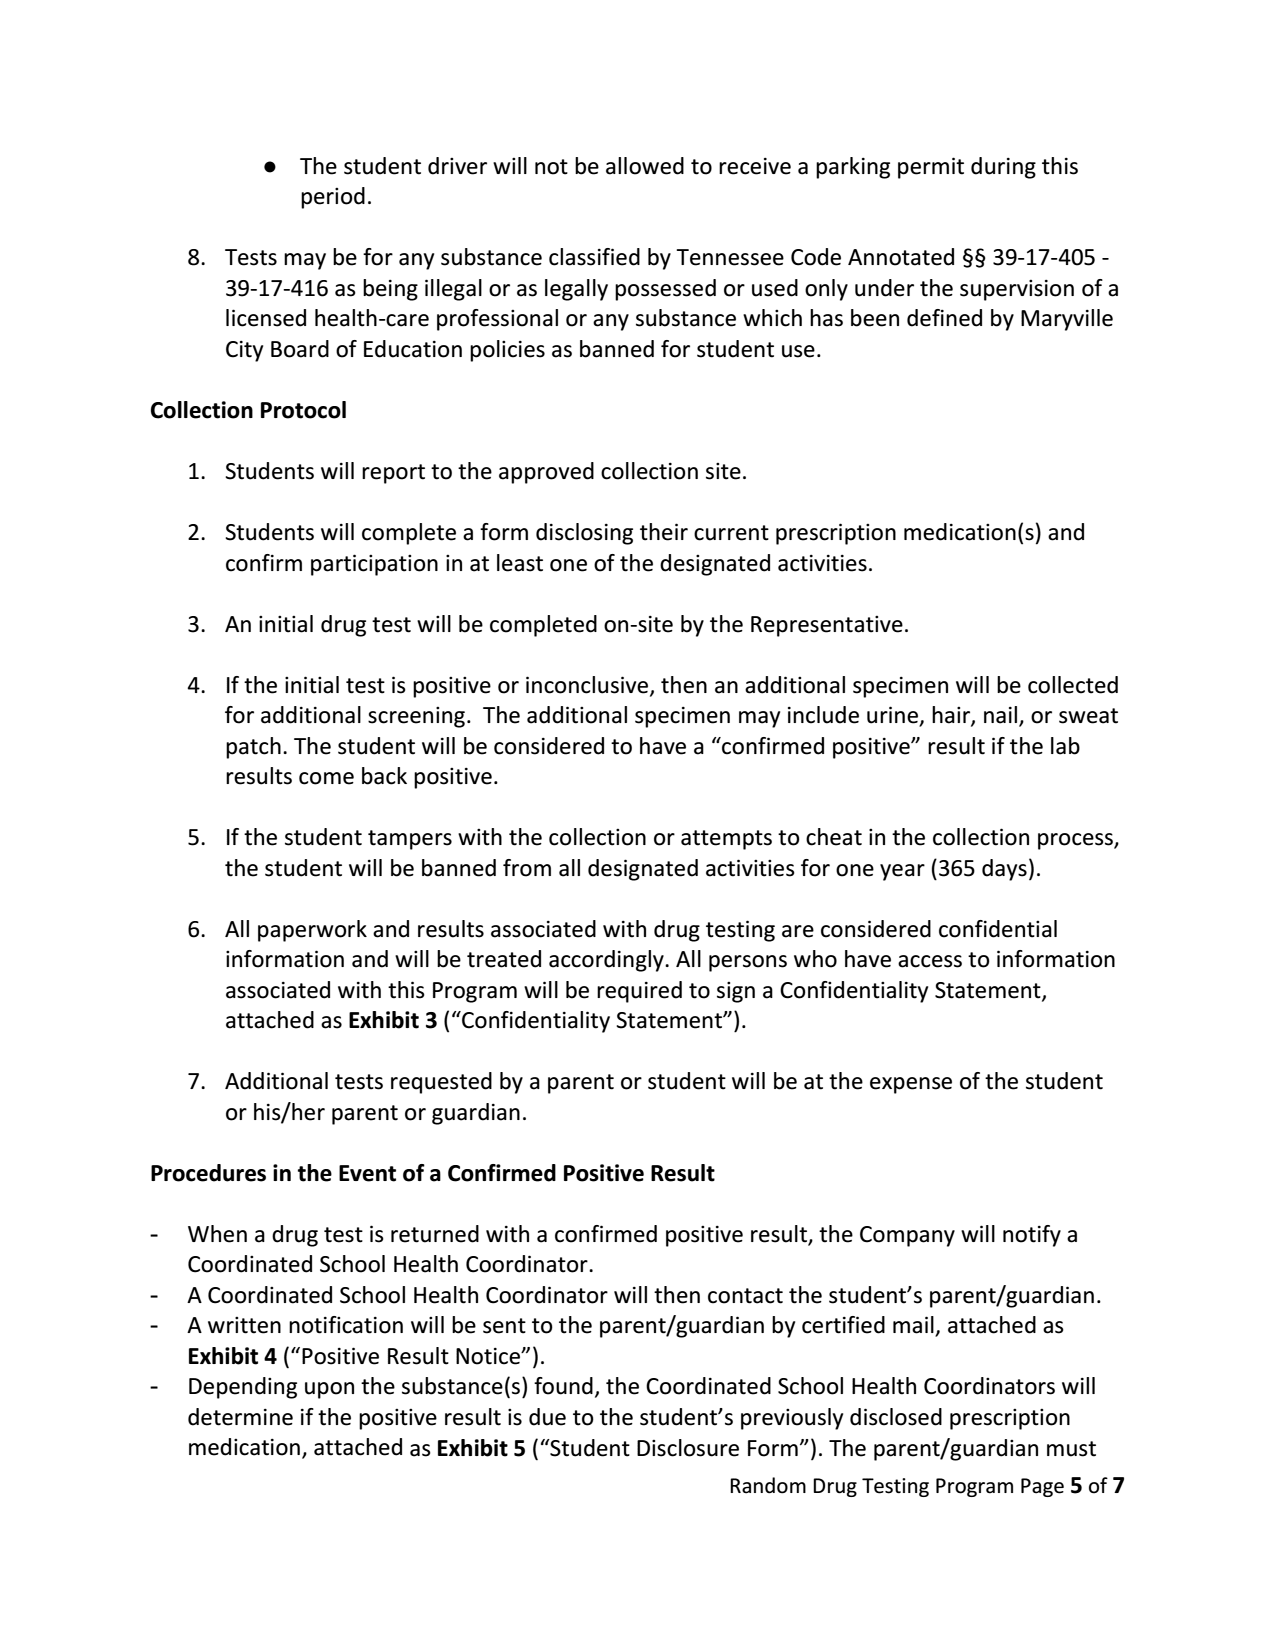 Random Drug Test Consent Form